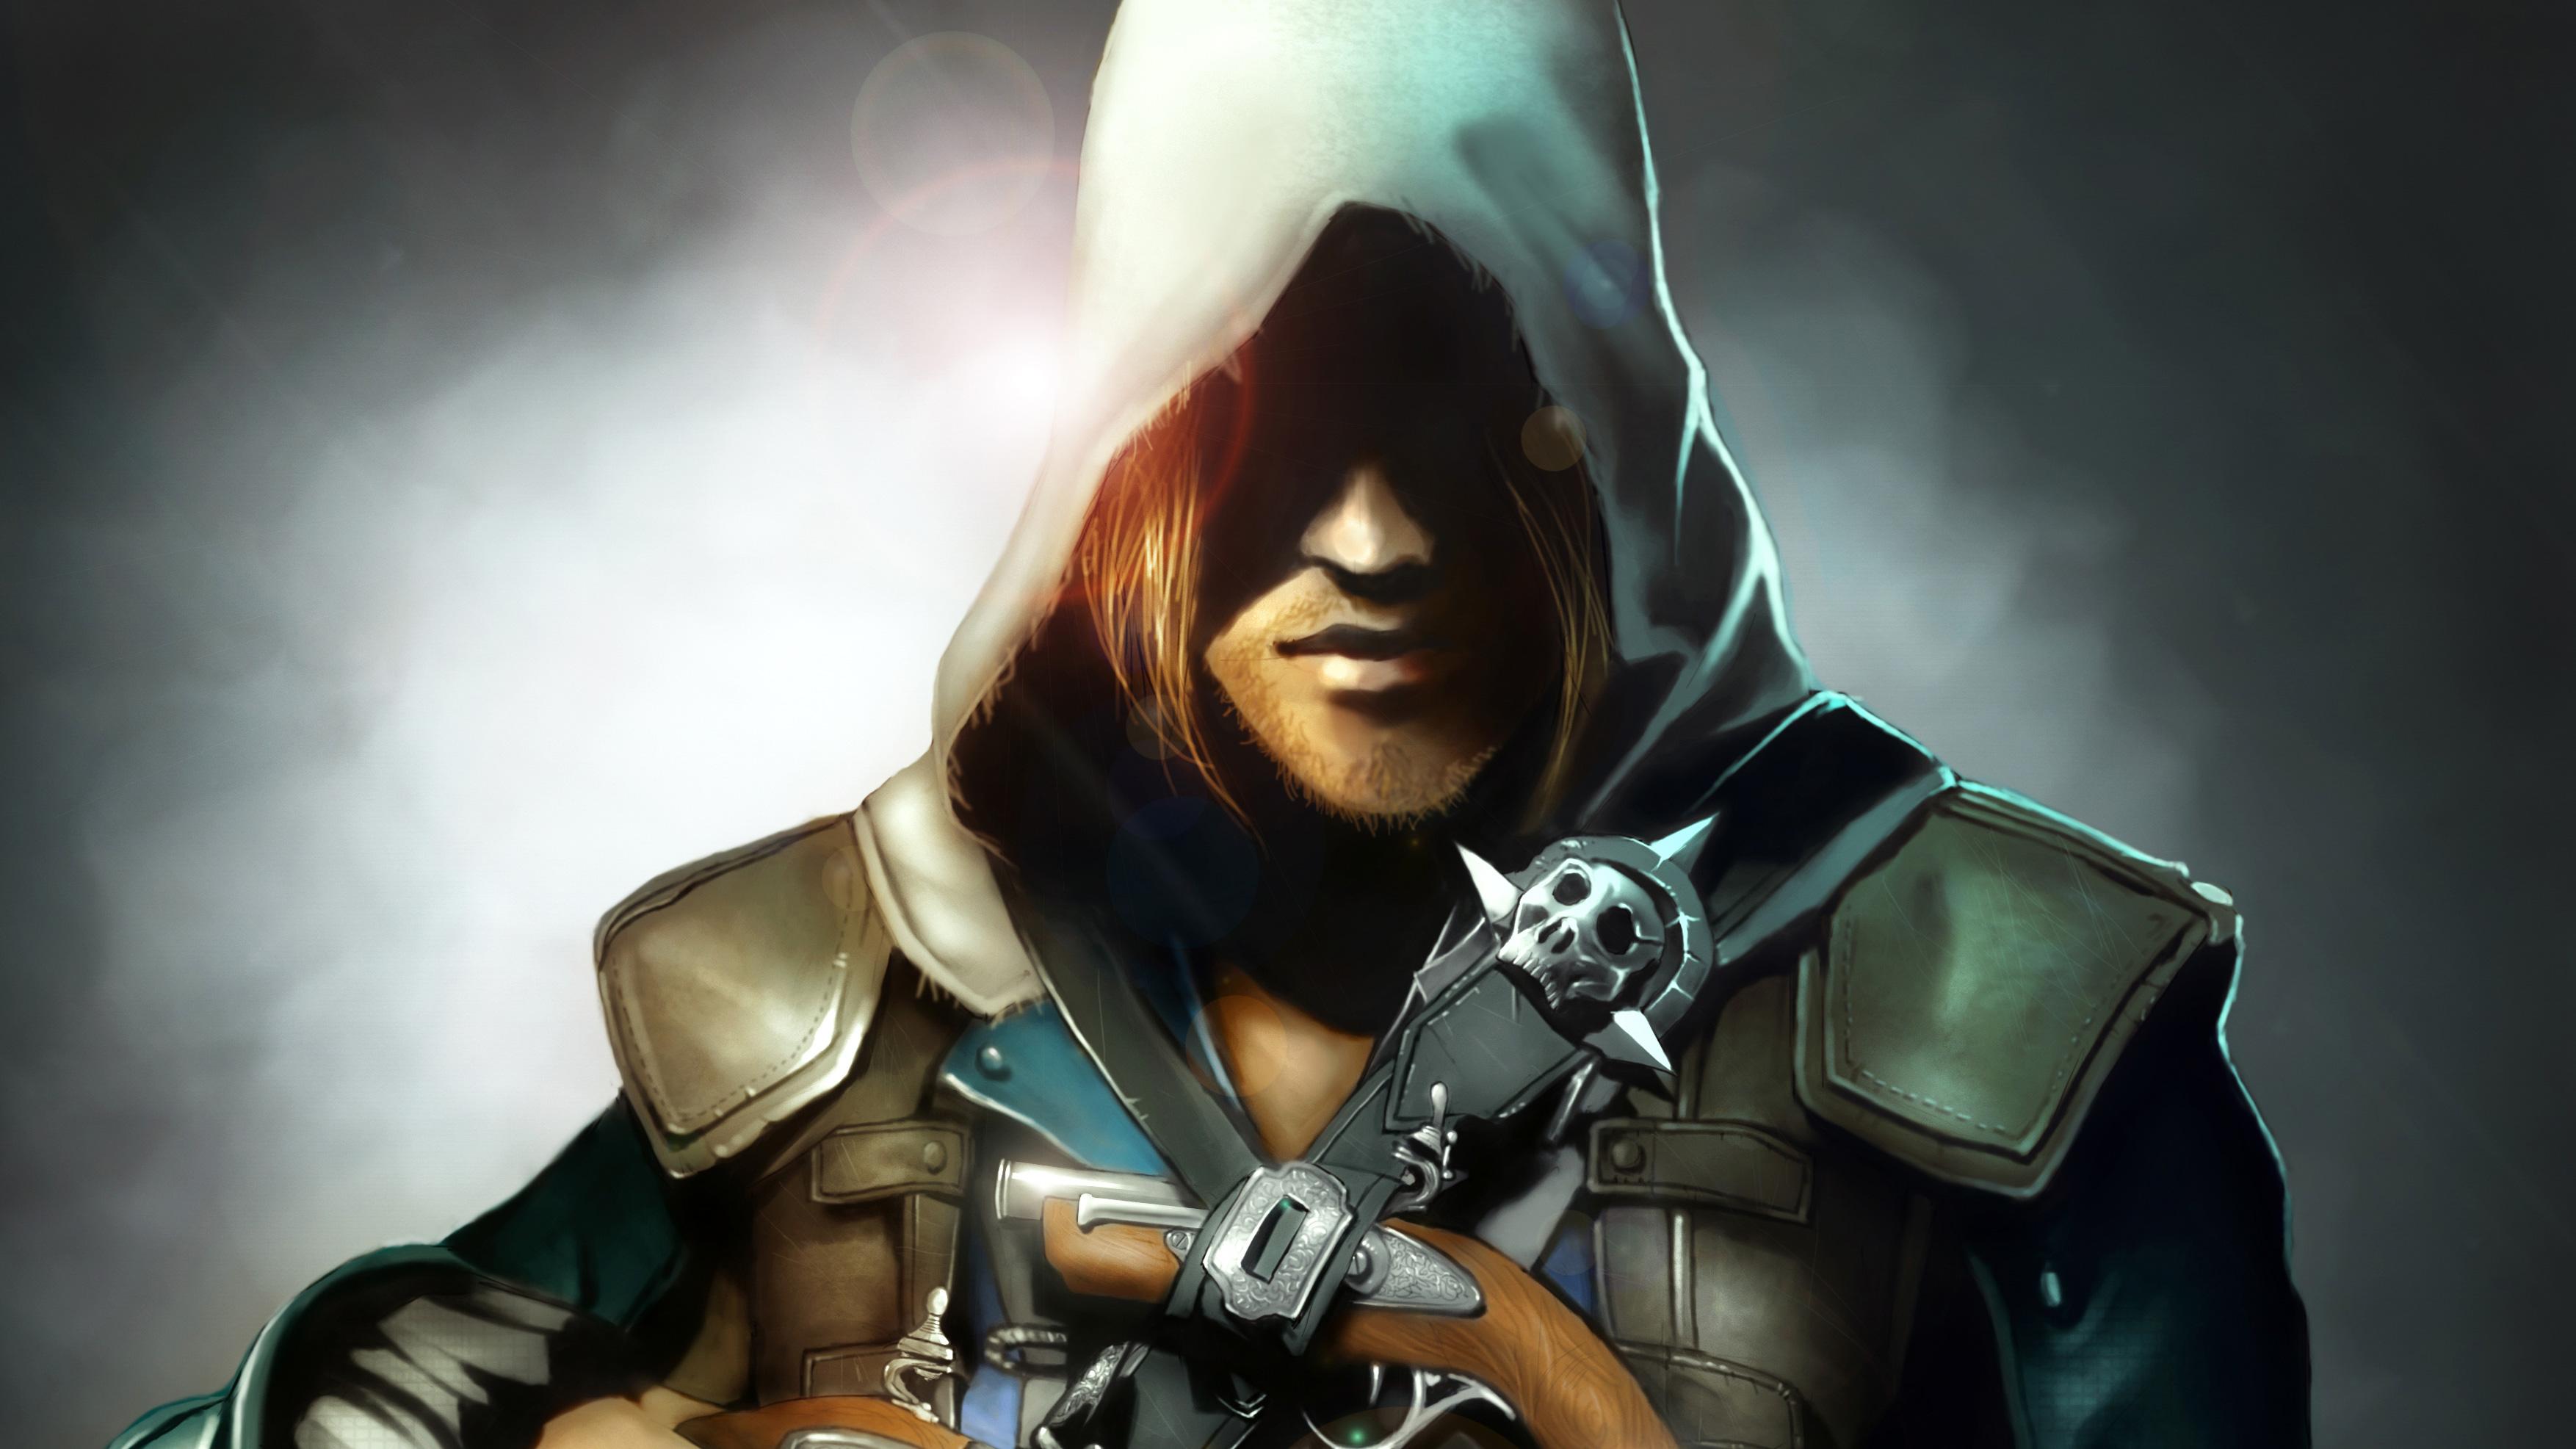 1920x1080 Assassins Creed 4 Black Flag Art Laptop Full Hd 1080p Hd